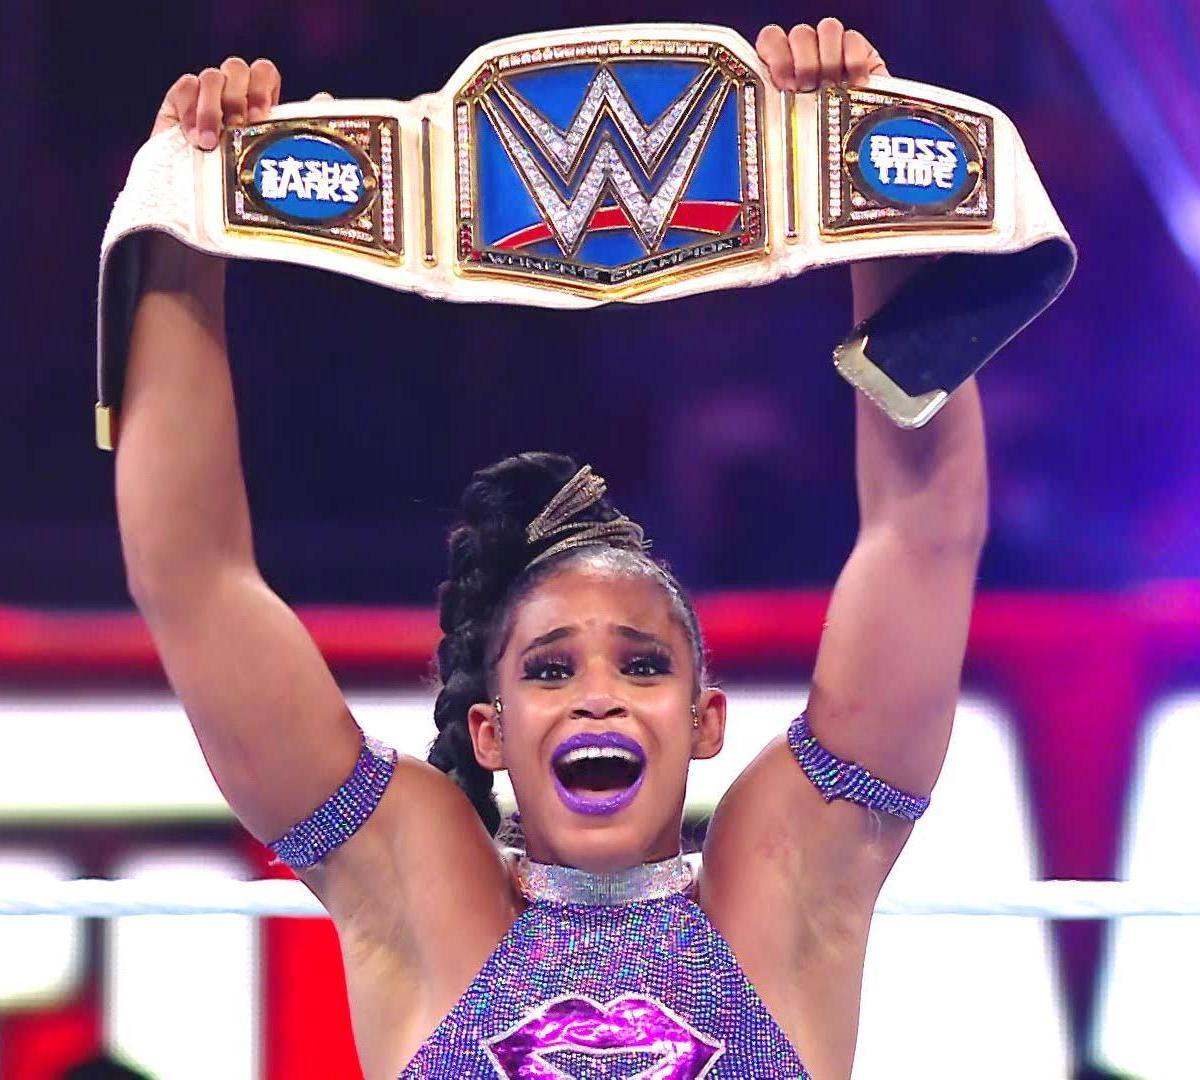 Bianca Belair and Sasha Banks Set New Standard at WrestleMania 37 Night 1 – Bleacher Report